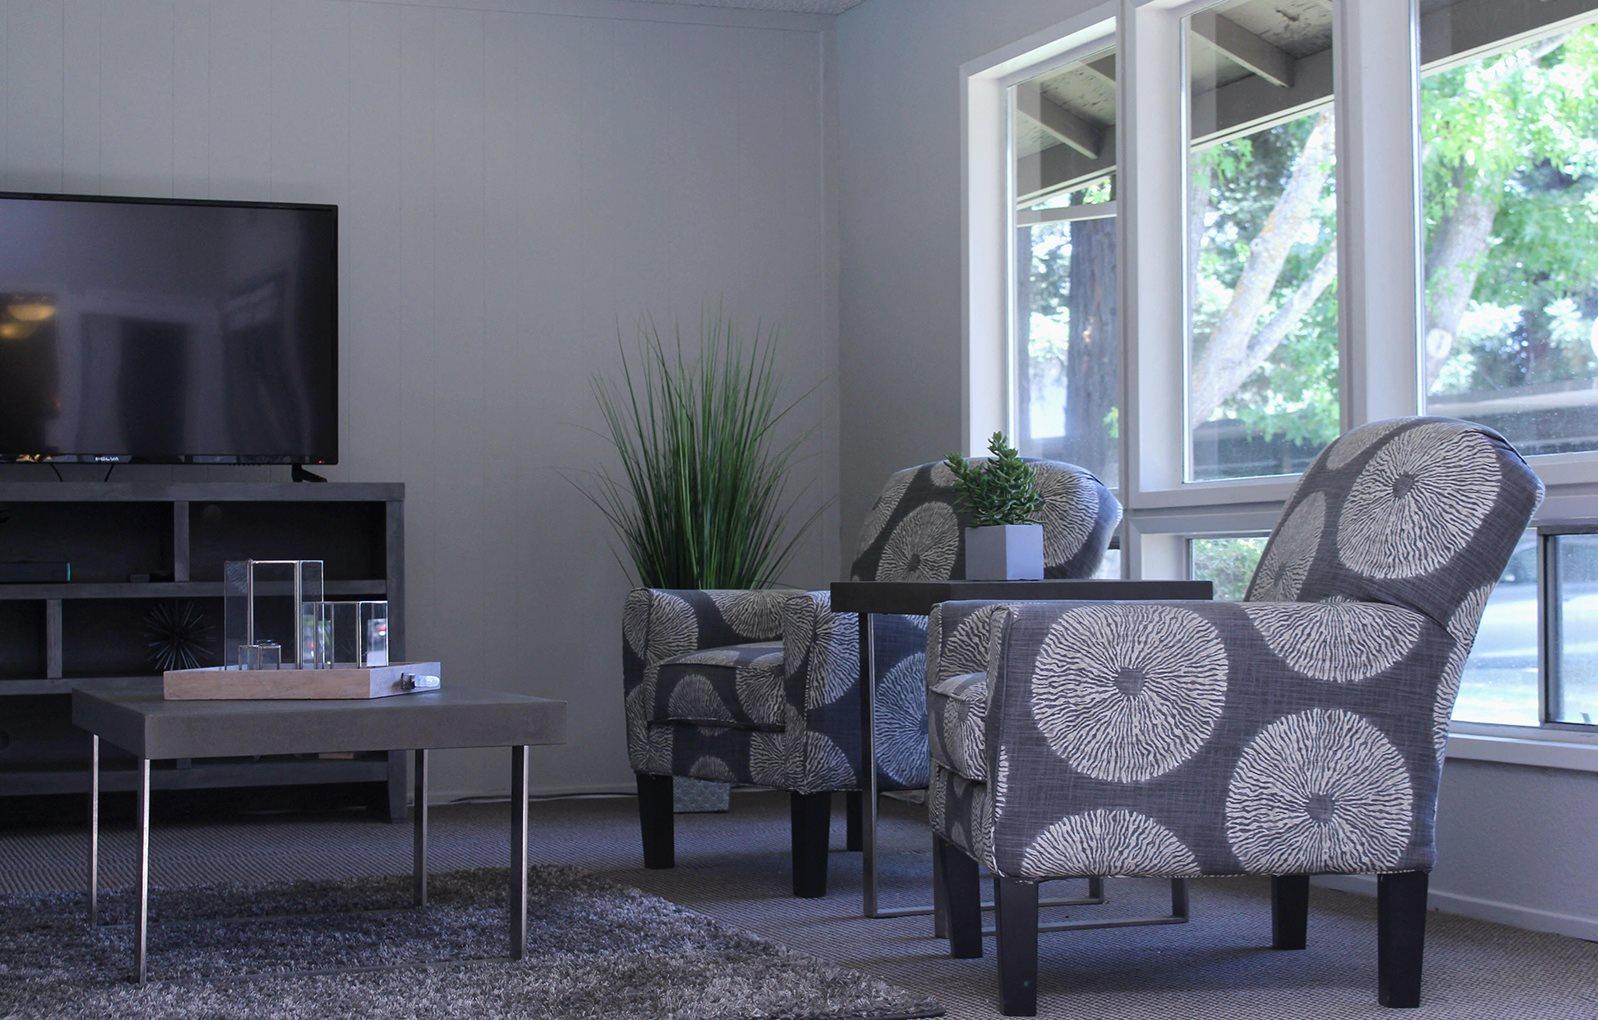 Shasta Terrace Apartments In Vacaville Ca